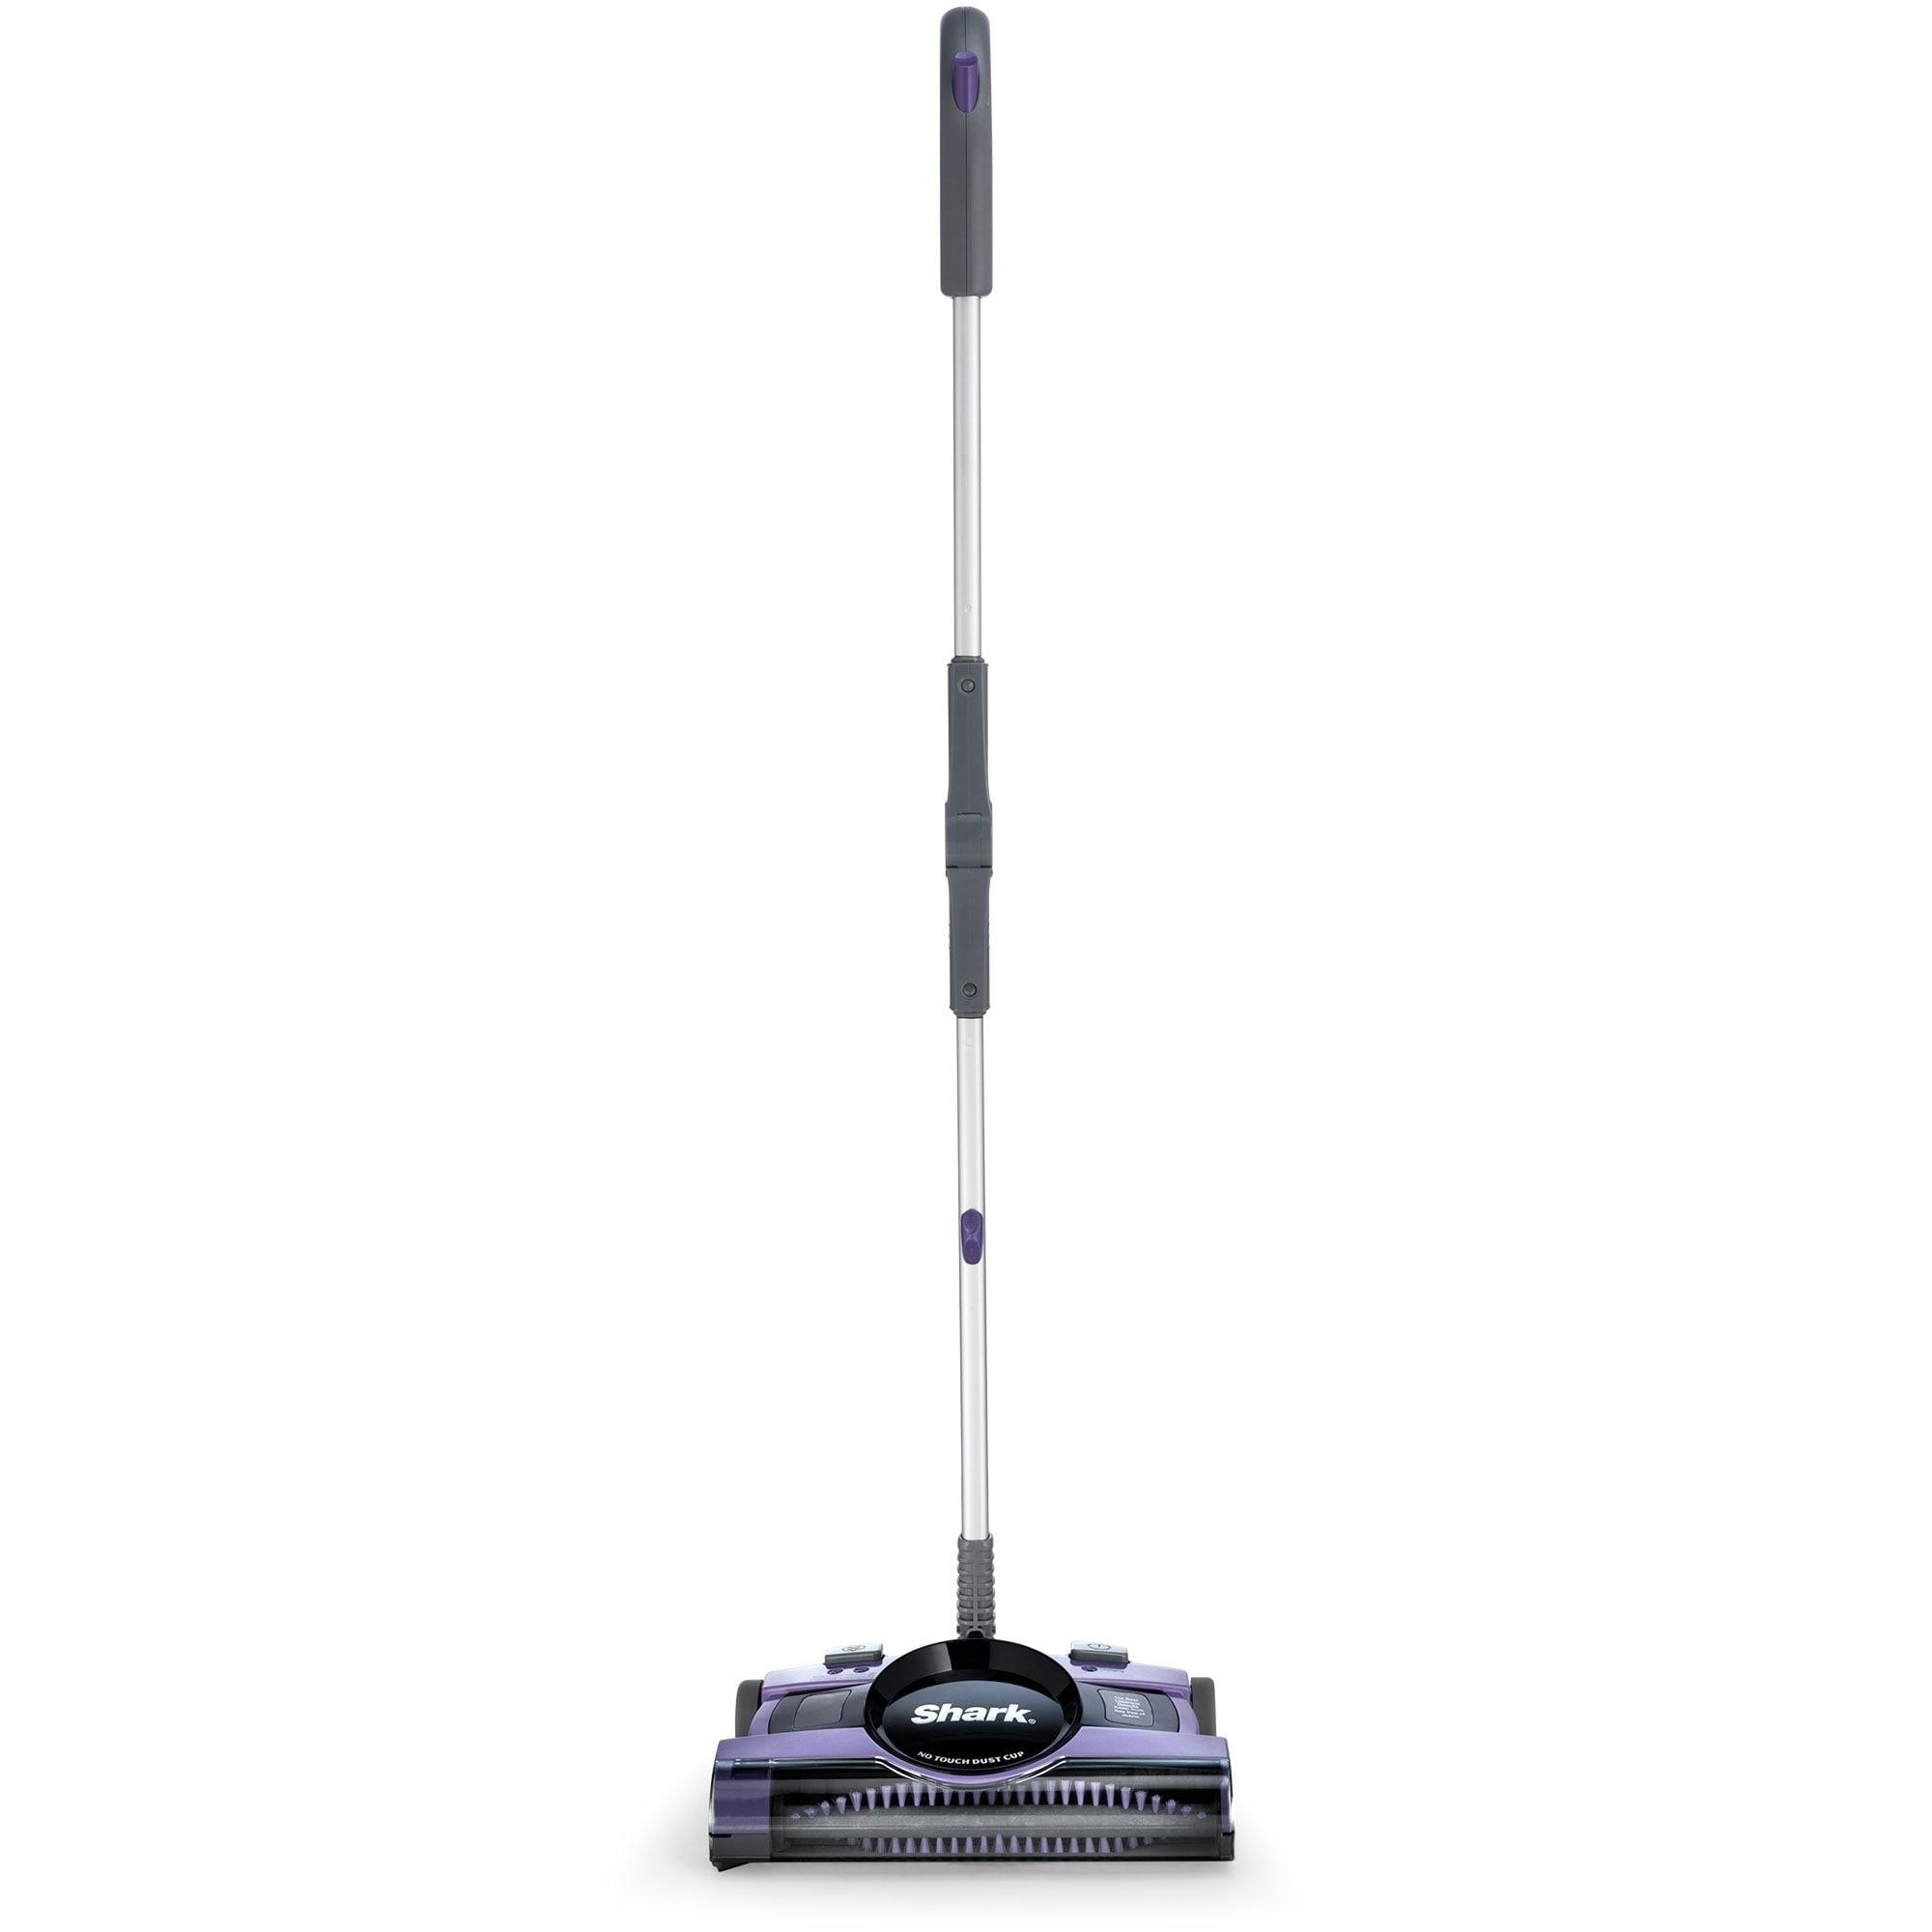 Shark V2945z 12 In Rechargeable Floor Carpet Sweeper With Xl Motorized Brush